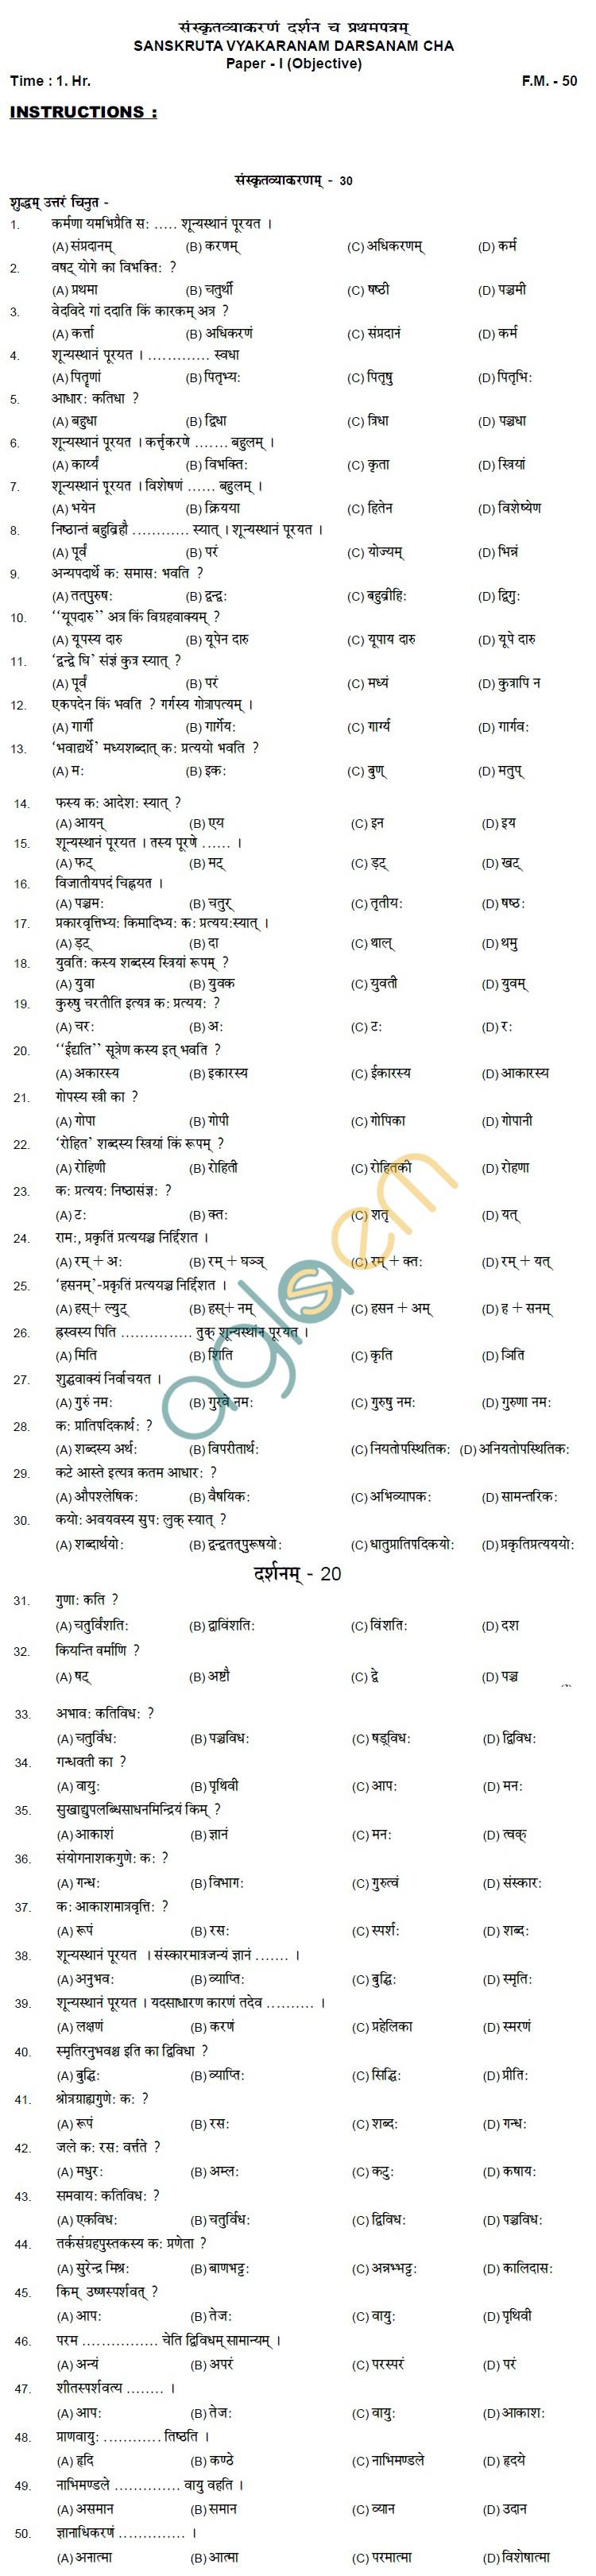 Odisha Board Sample Papers for Madhyama Sanskrit Exam 2014 - VOD